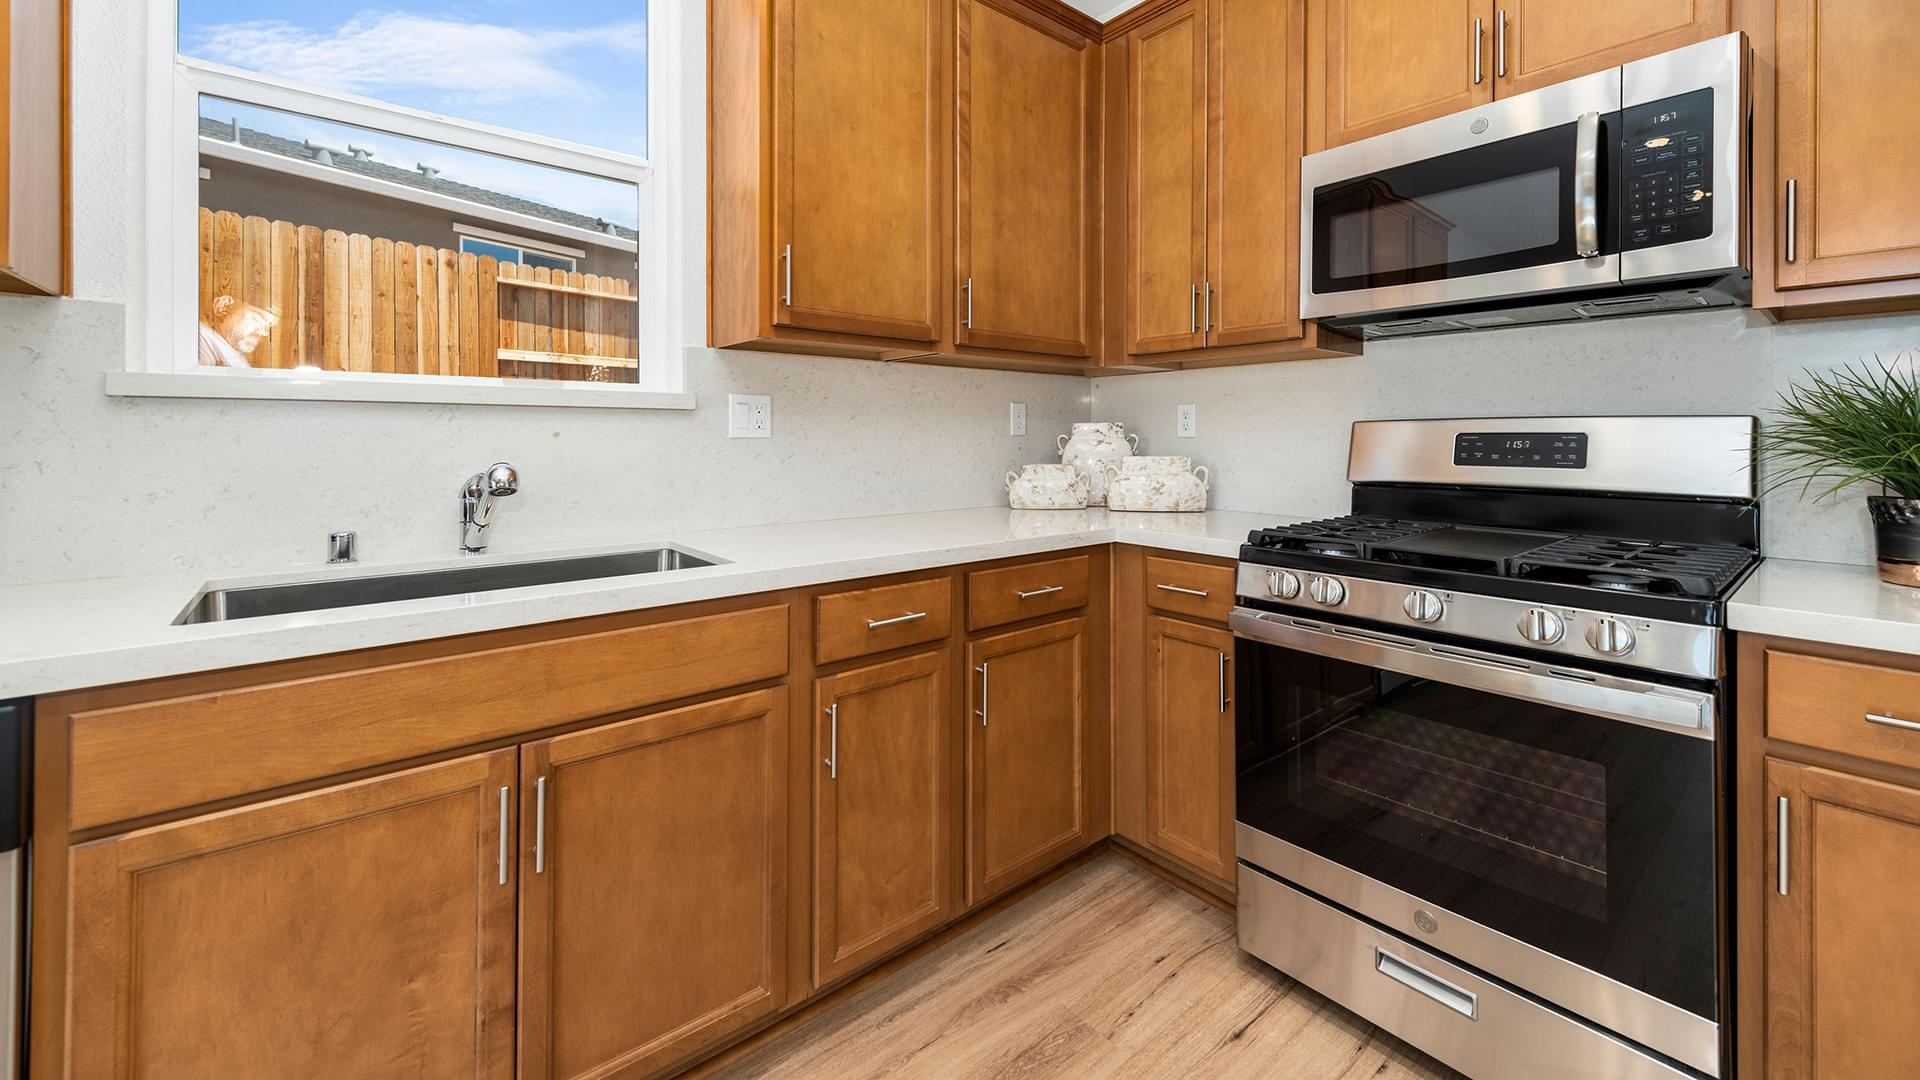 Residence 1 | Lot 166 | Kitchen